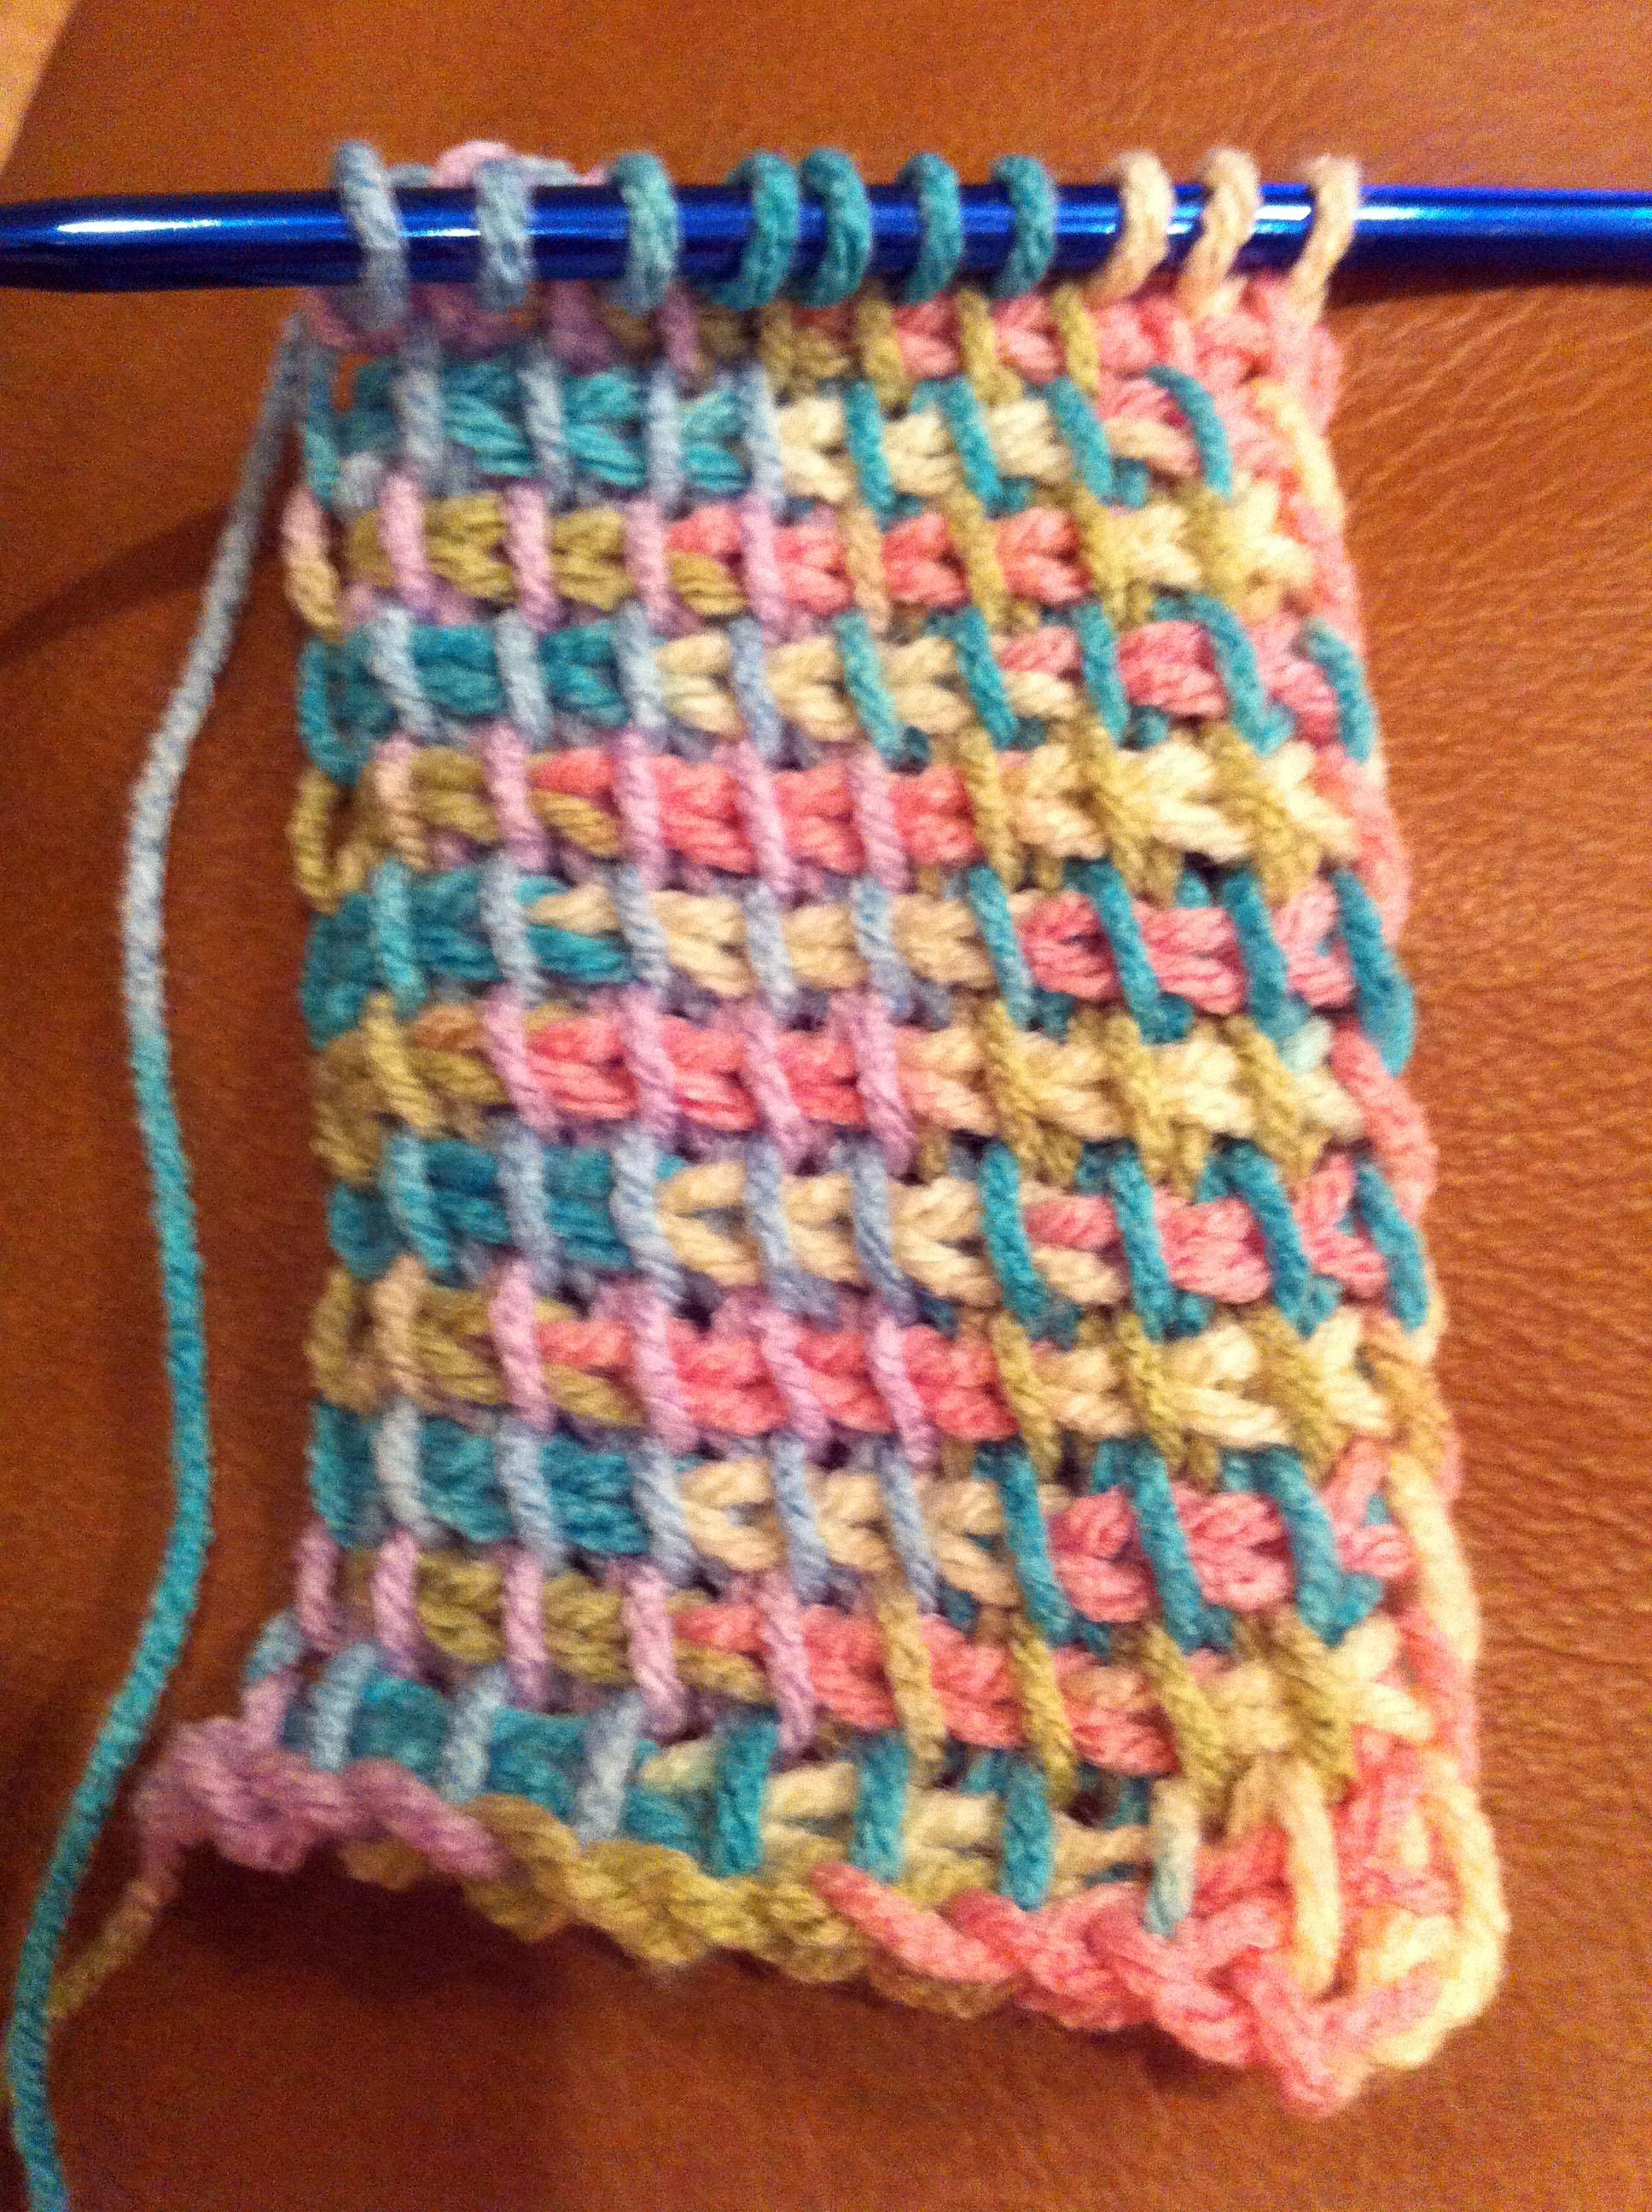 Tunisian Crochet Pattern Maker : My First Tunisian Crochet Scarf - House Full of Monkeys